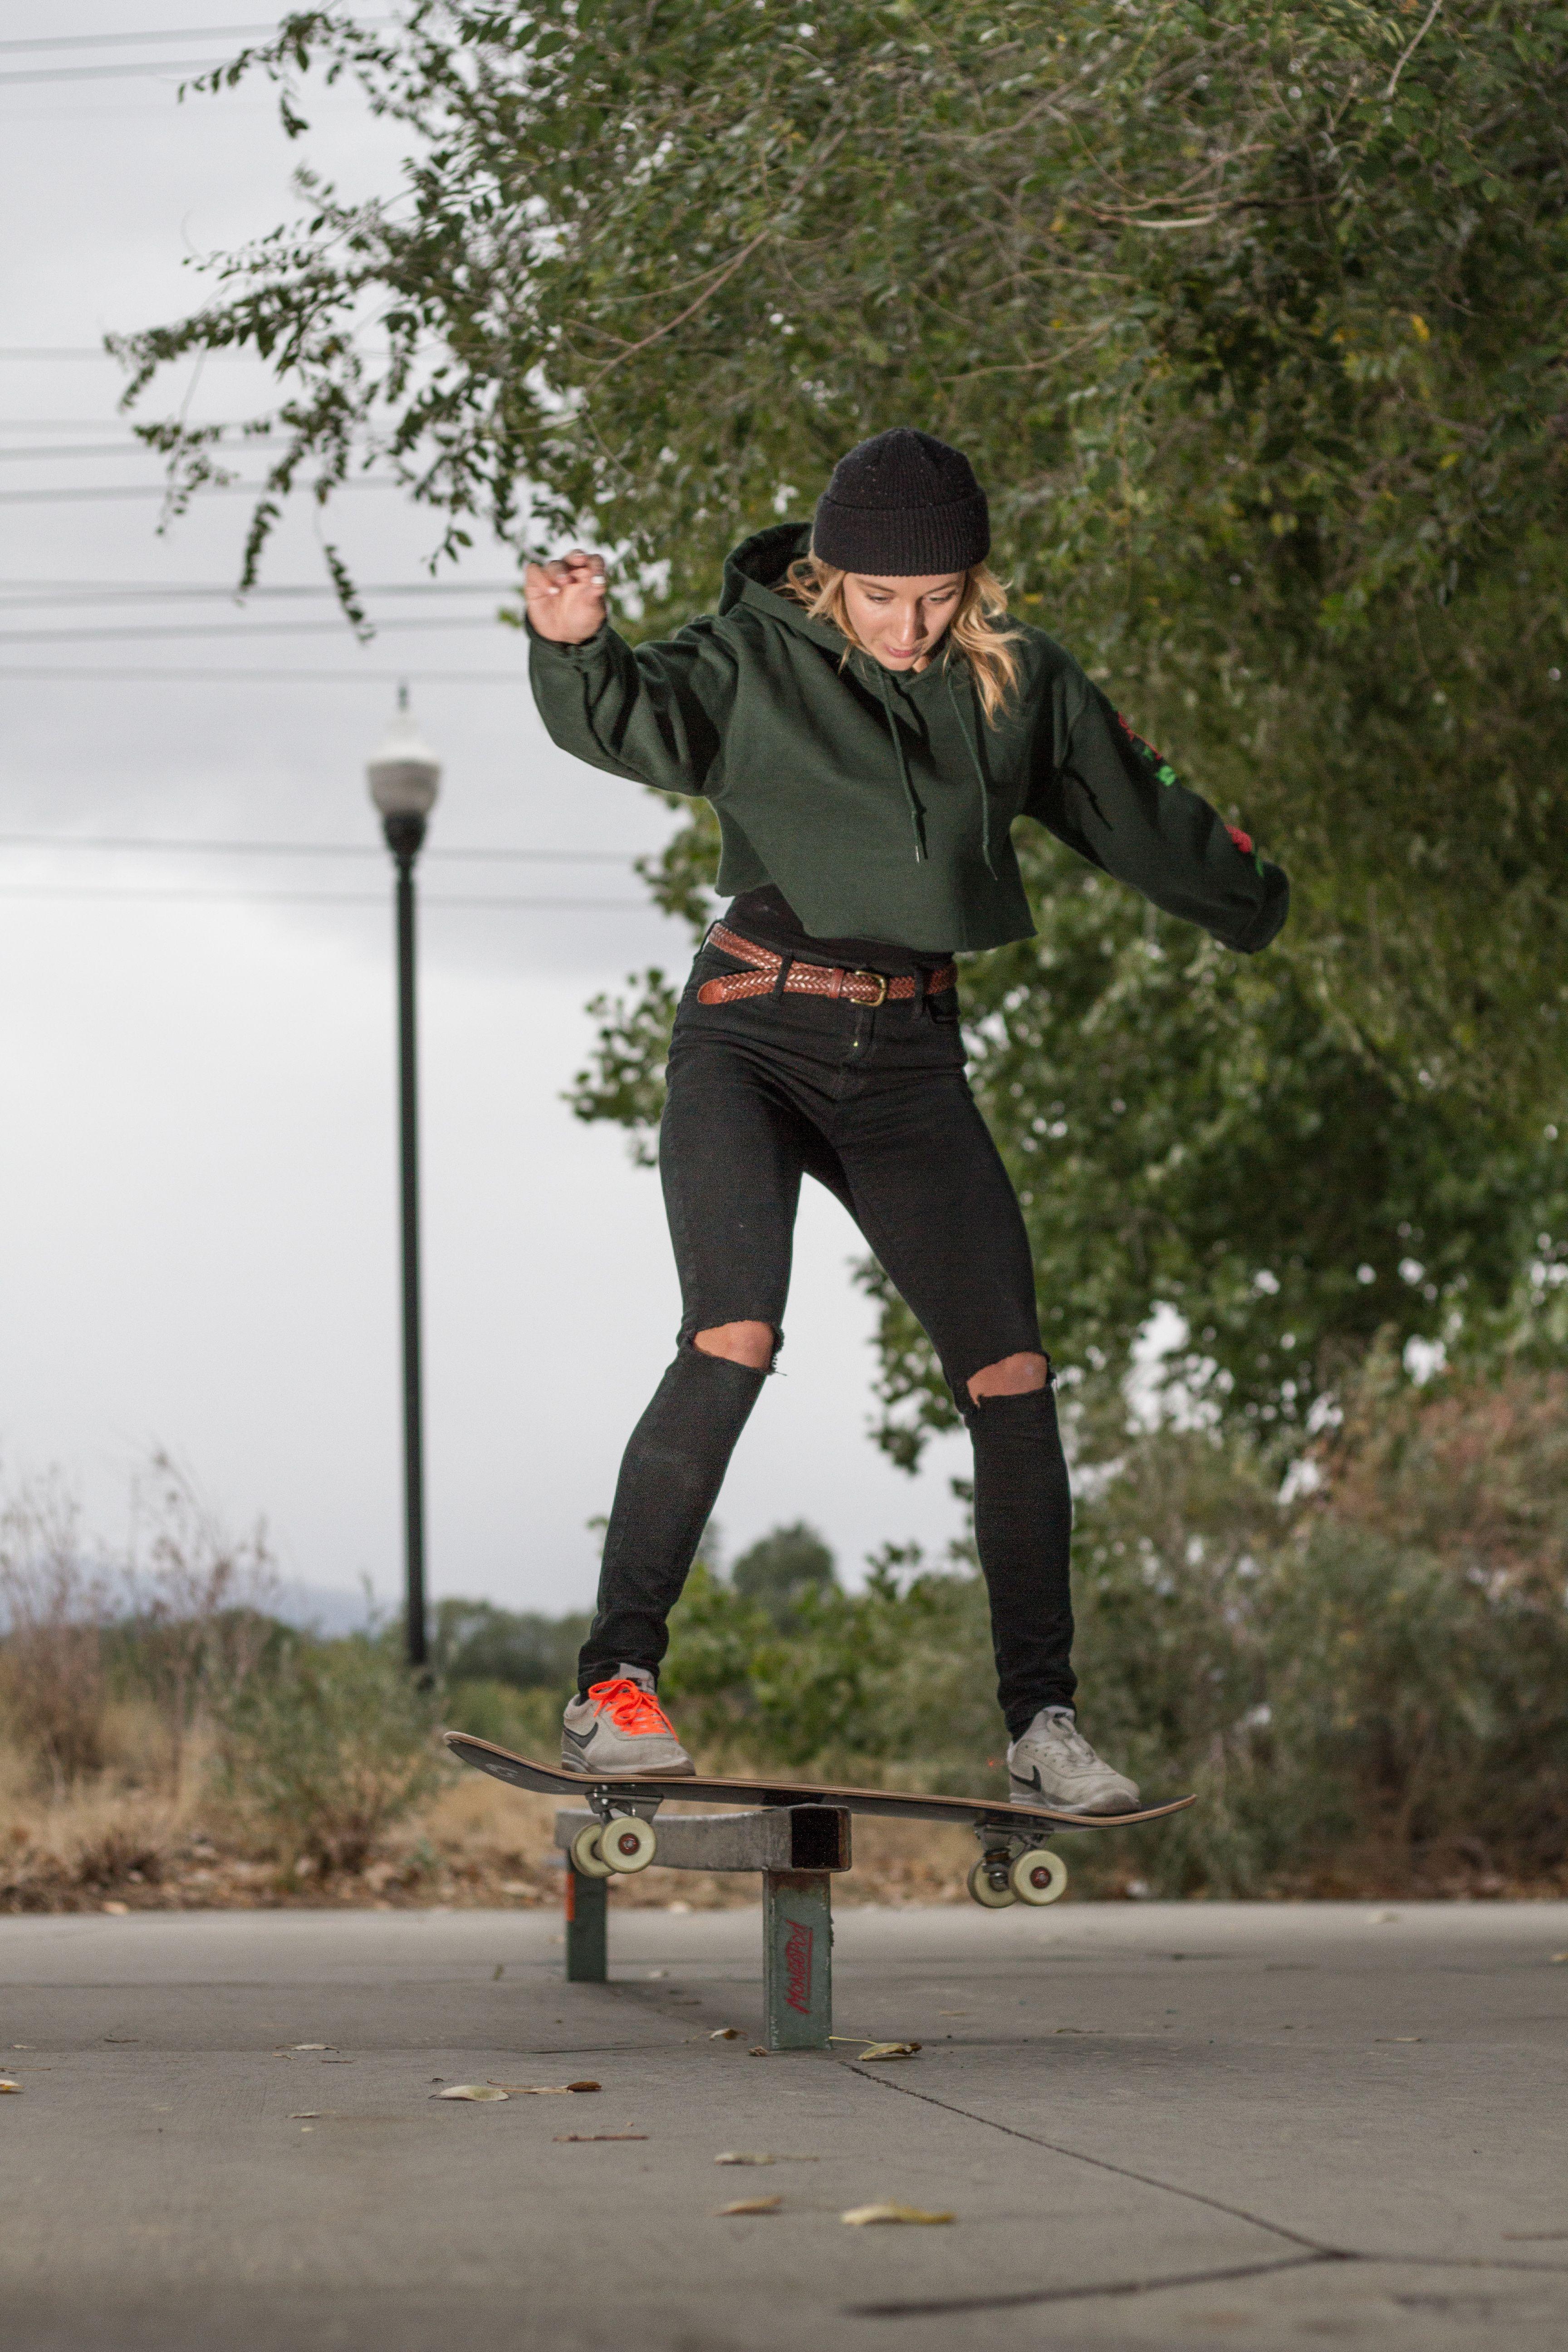 Skate like a girl 👊 | Skateboard fashion